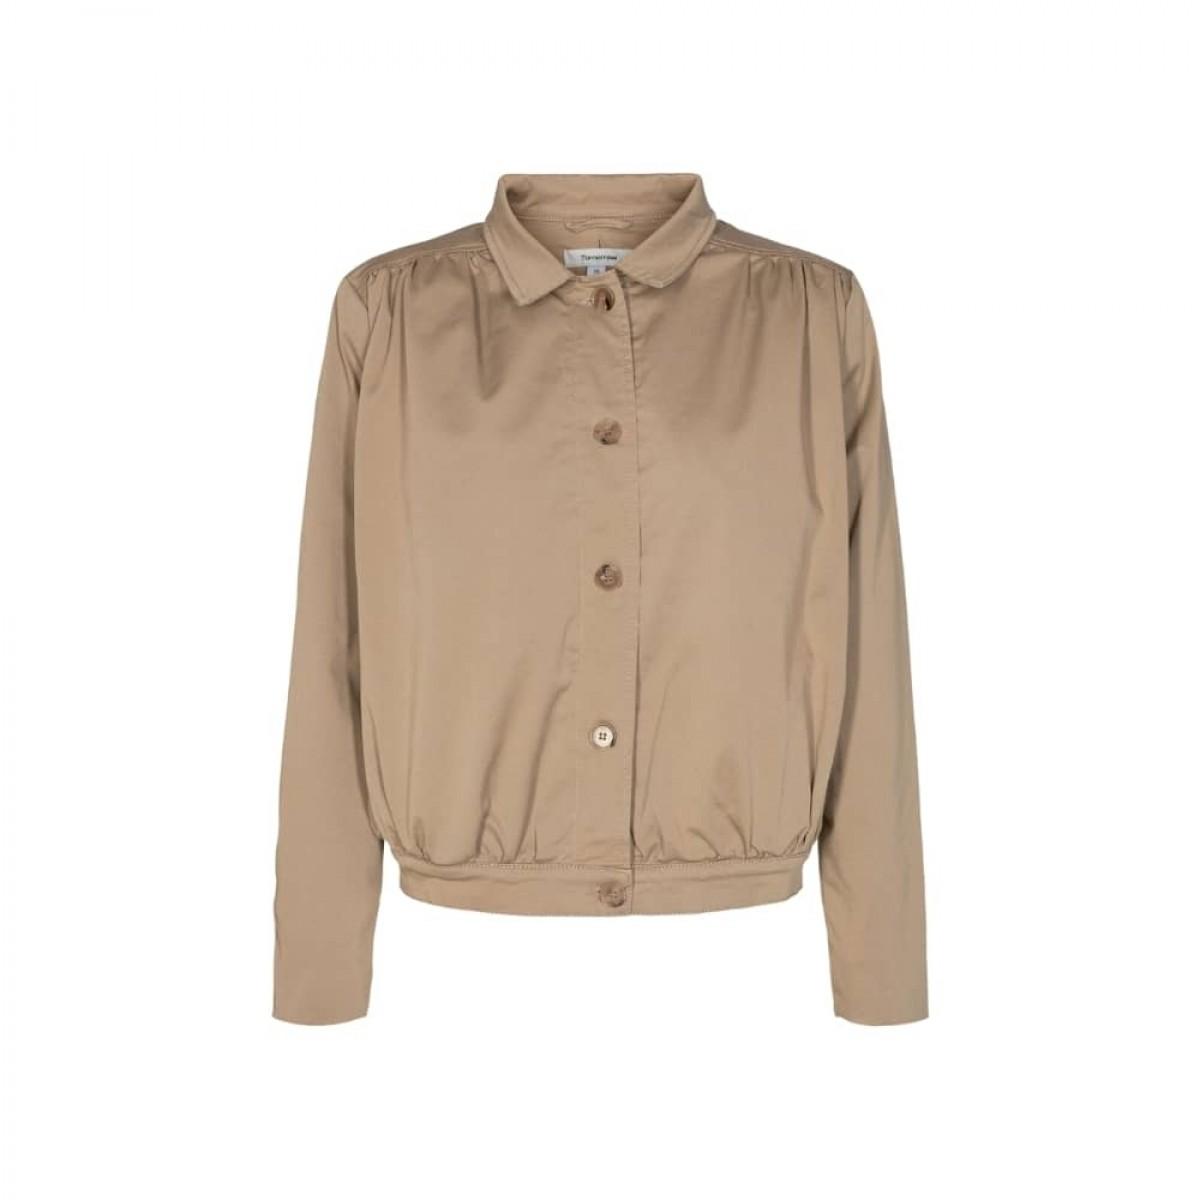 greta cropped jacket - camel - front